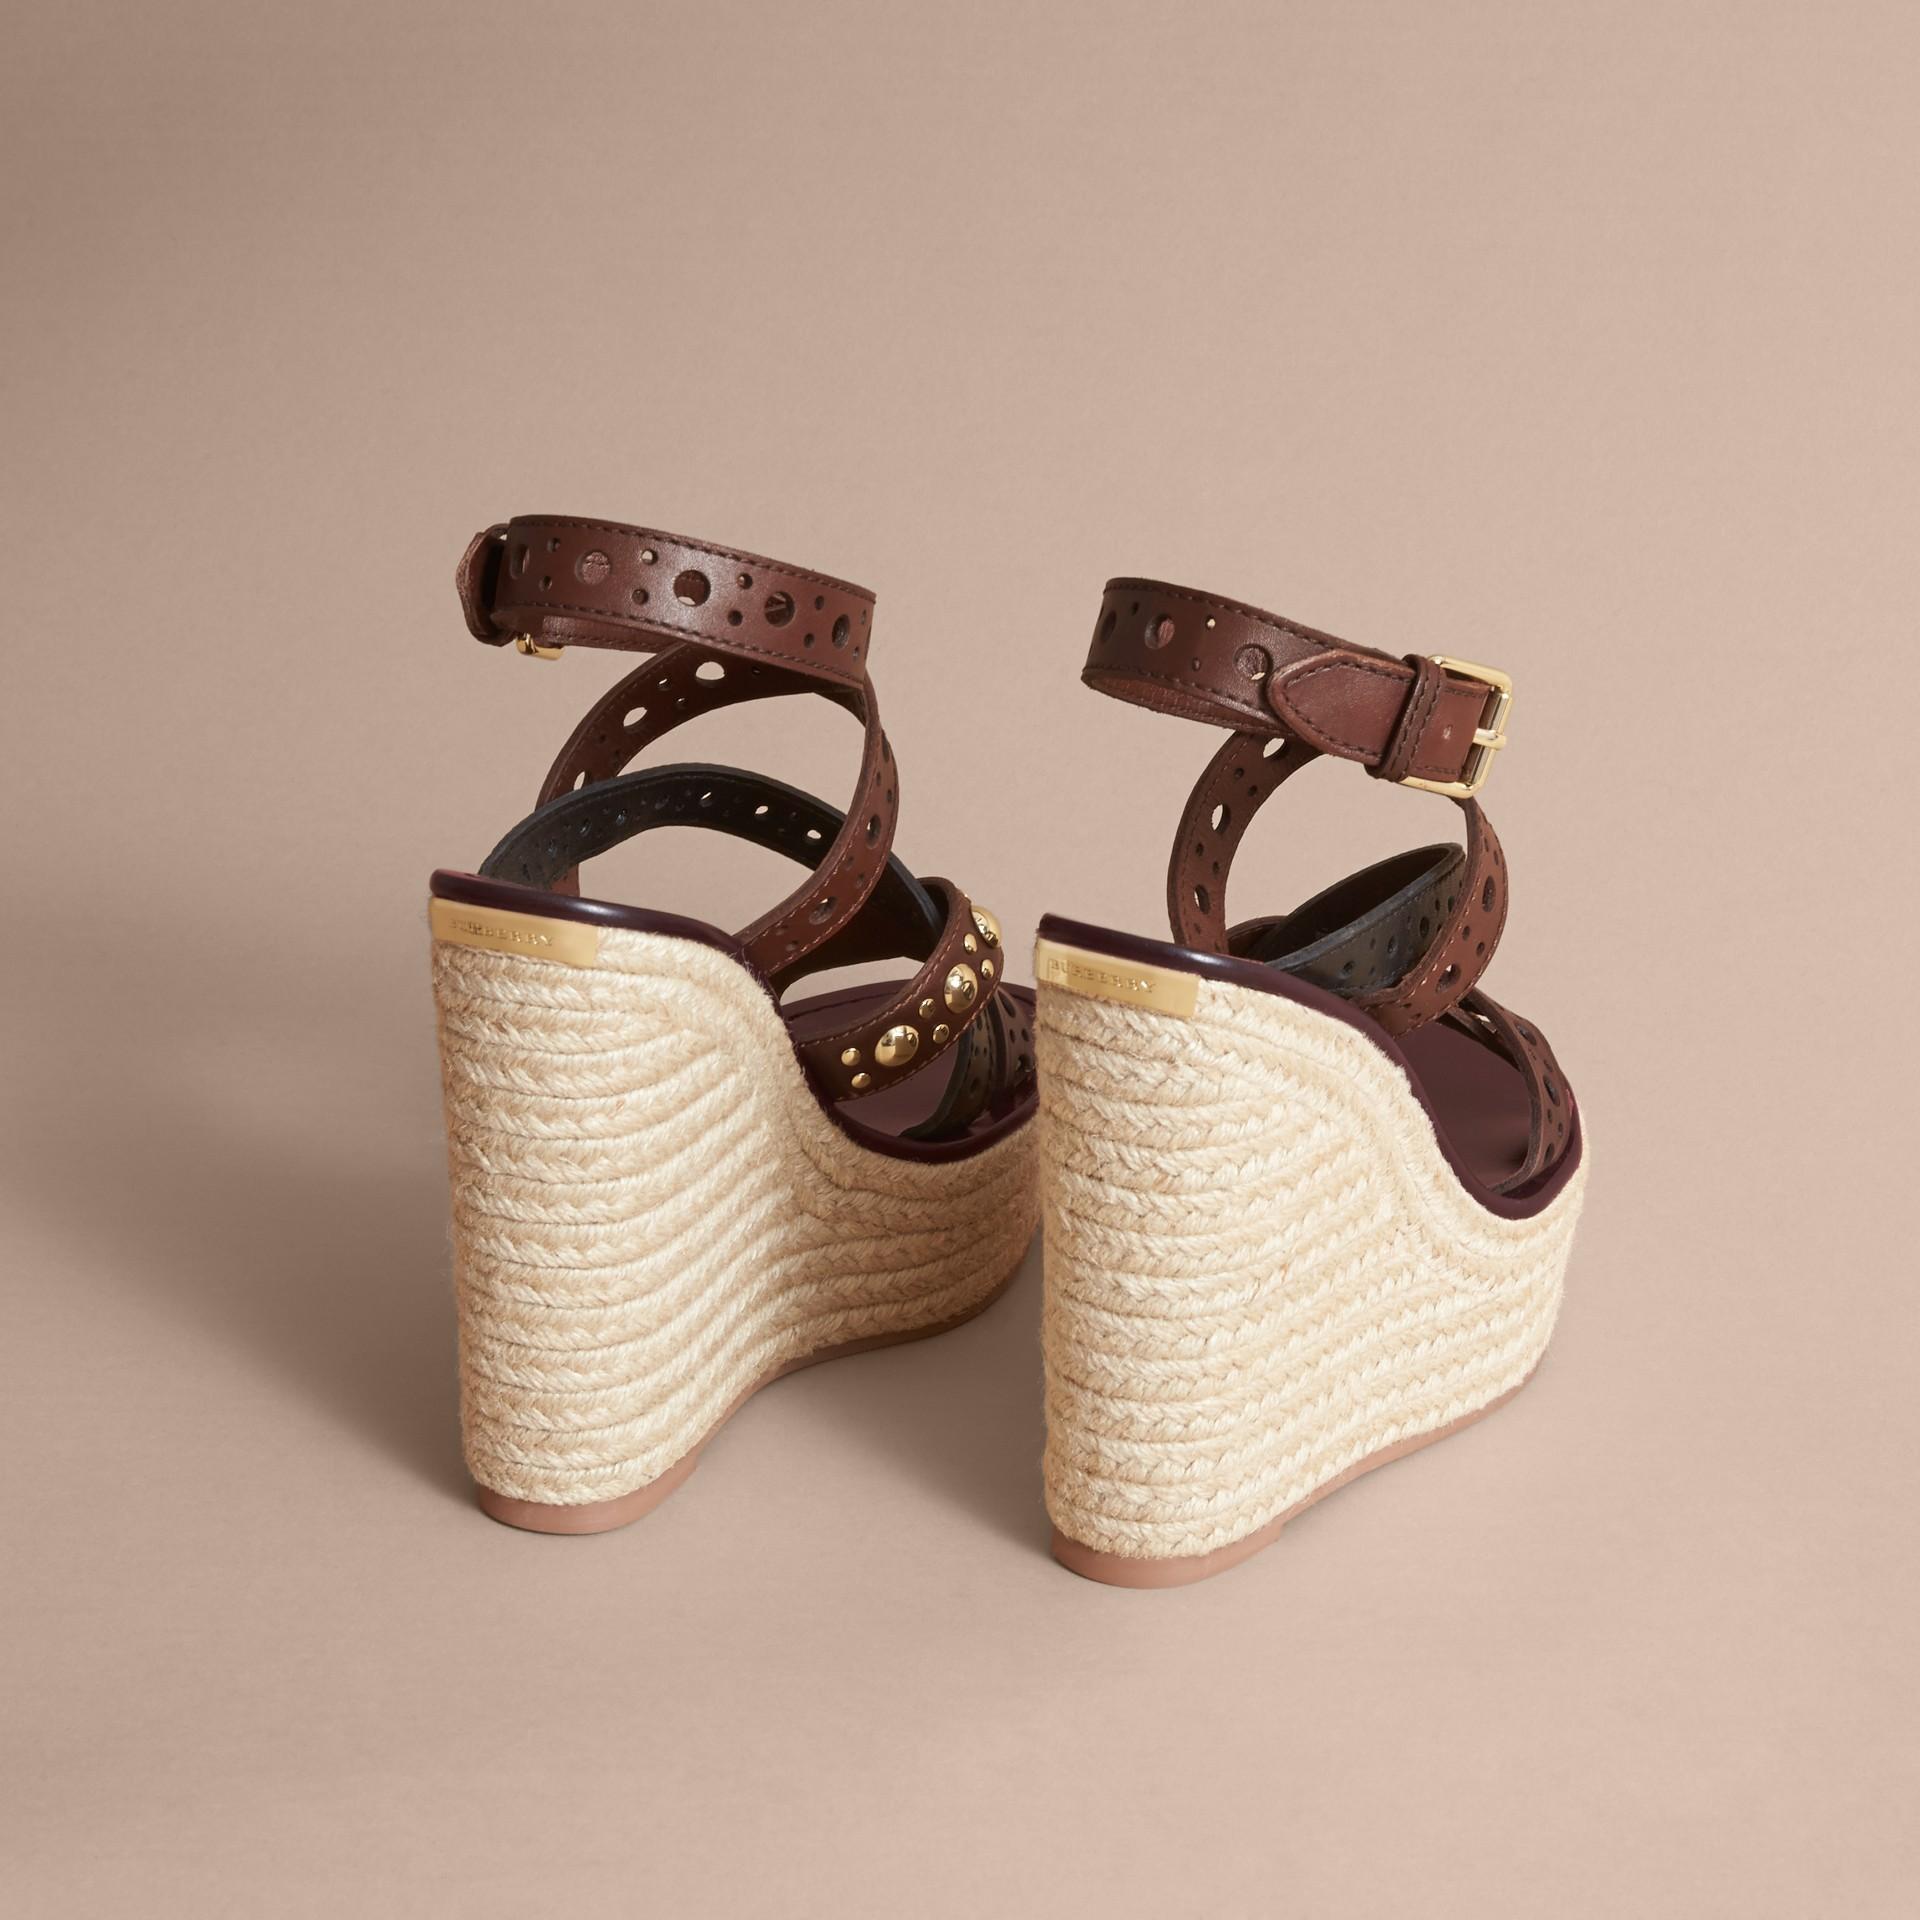 Riveted Leather Platform Espadrille Wedge Sandals - gallery image 4